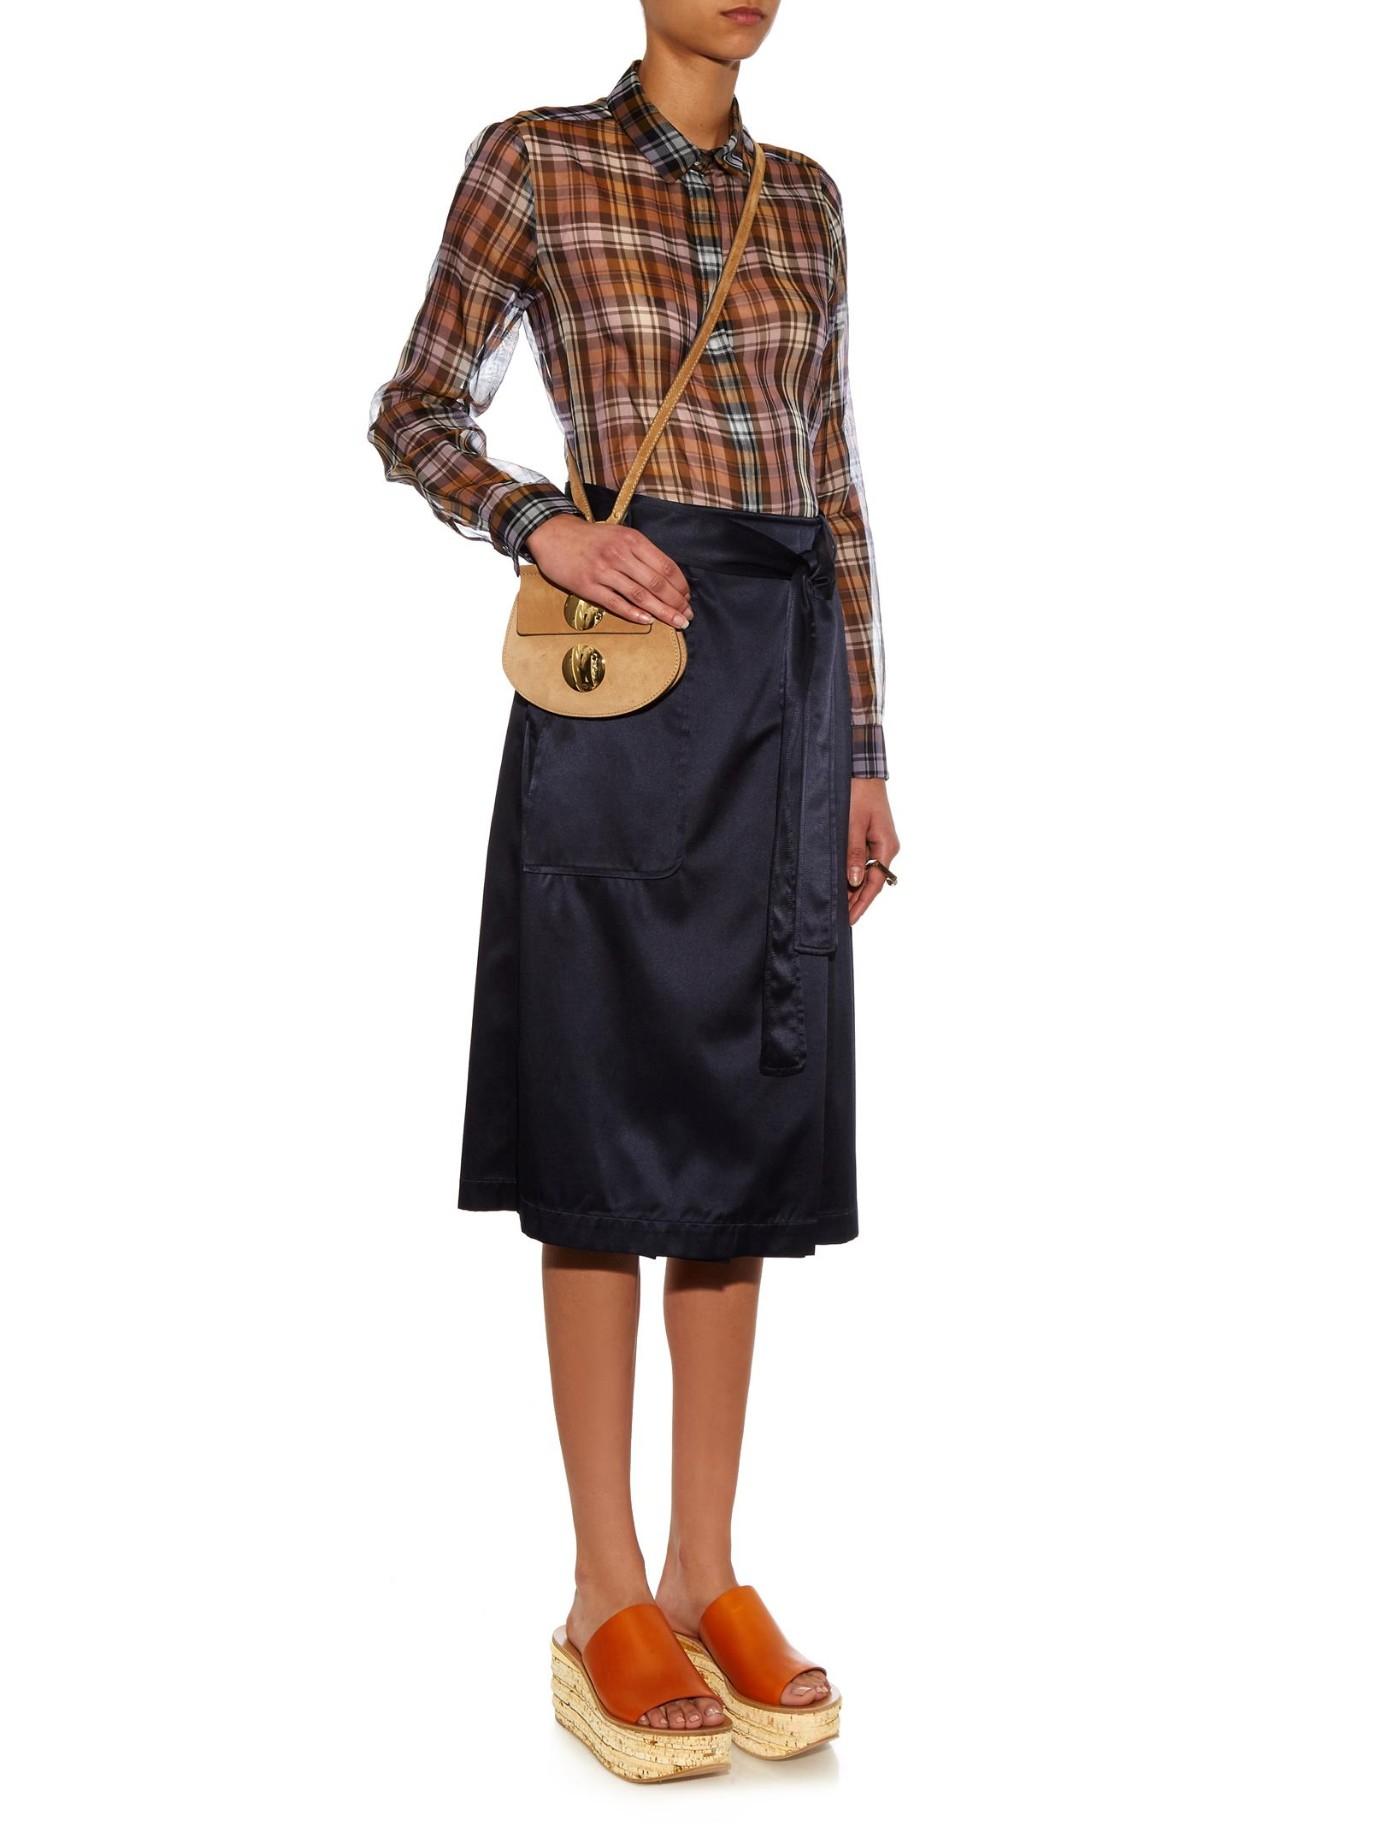 2021633b3f5c2 Chloé Mini Faye Suede Cross-Body Bag in Brown - Lyst